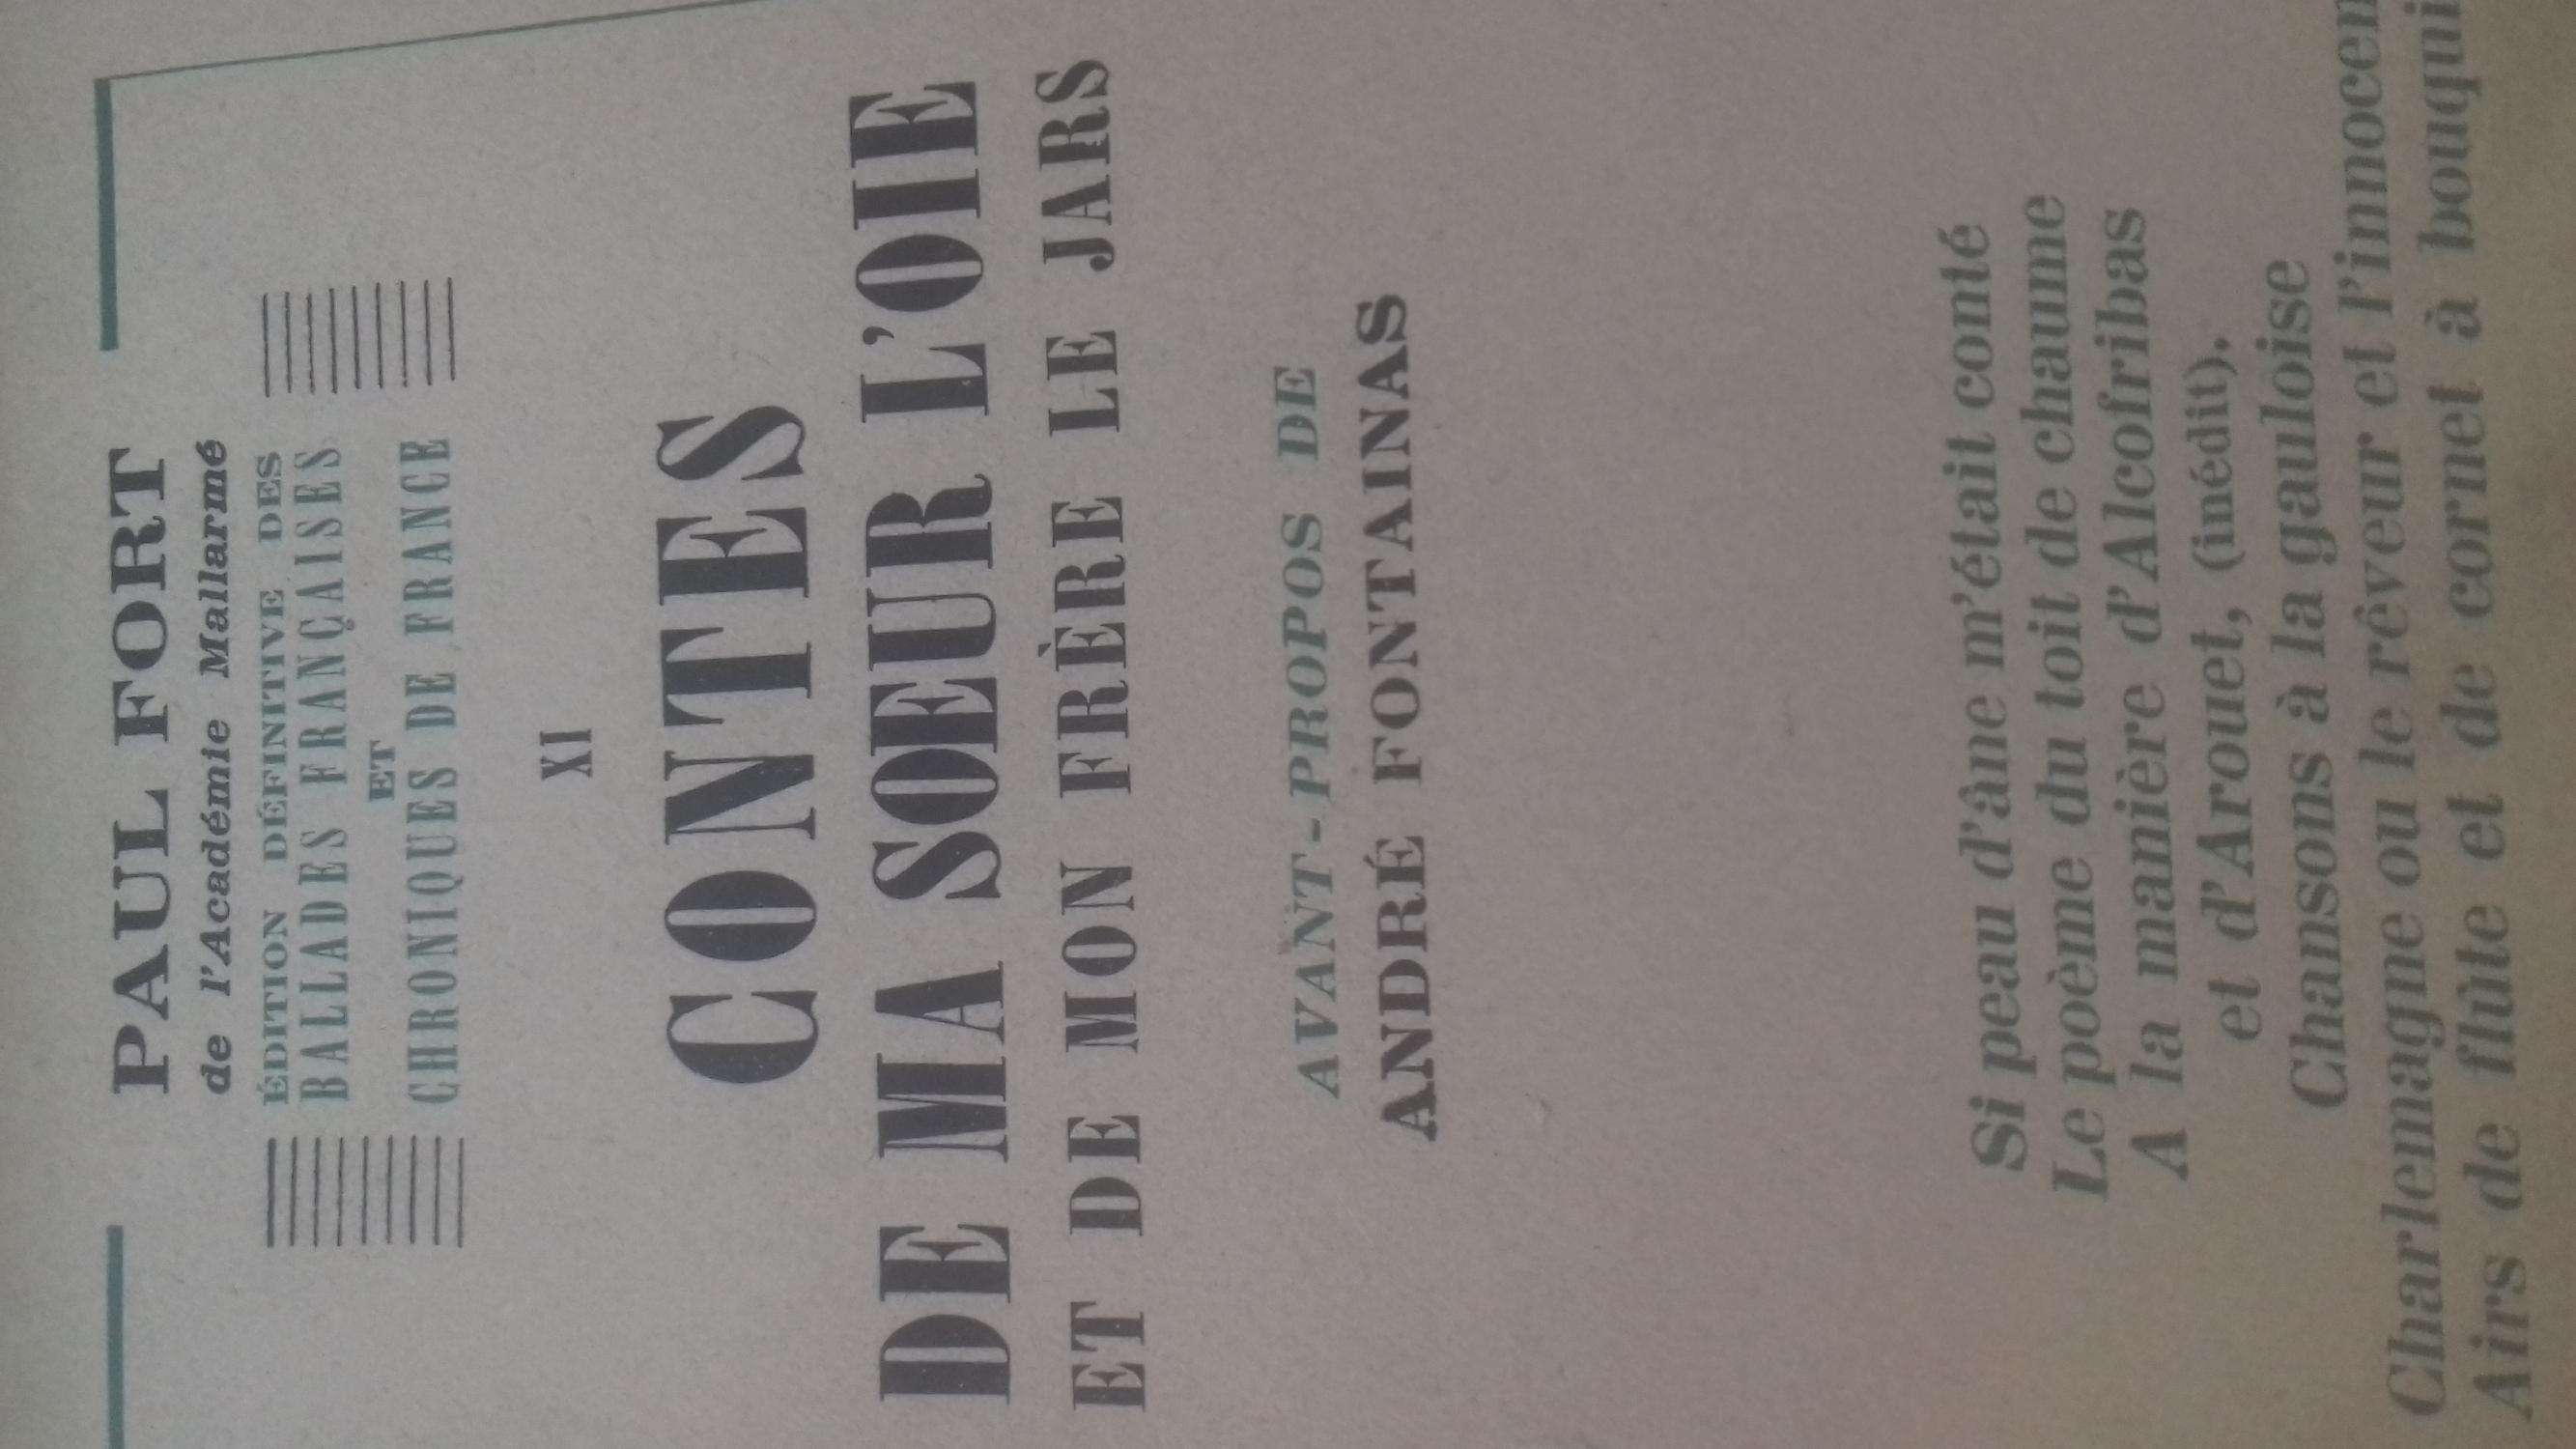 Edition Definitive Des Ballades Francaises